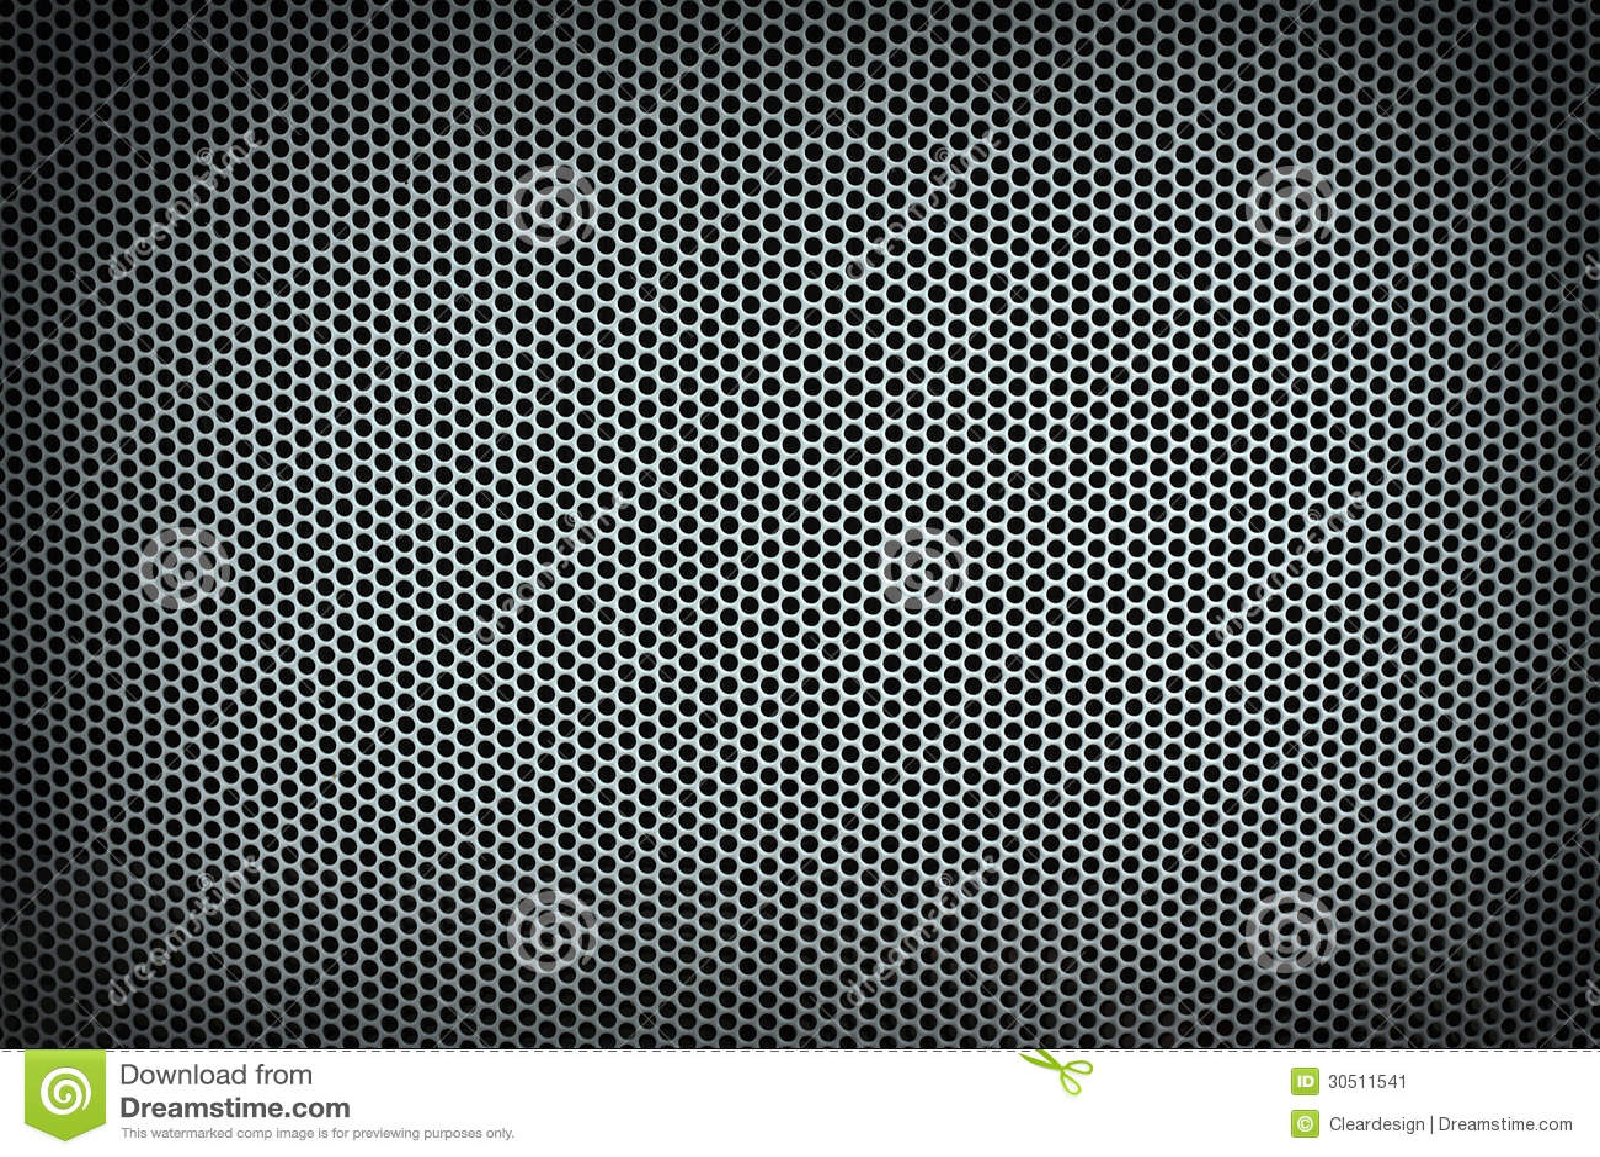 textura metalica futurista chanel - photo #15